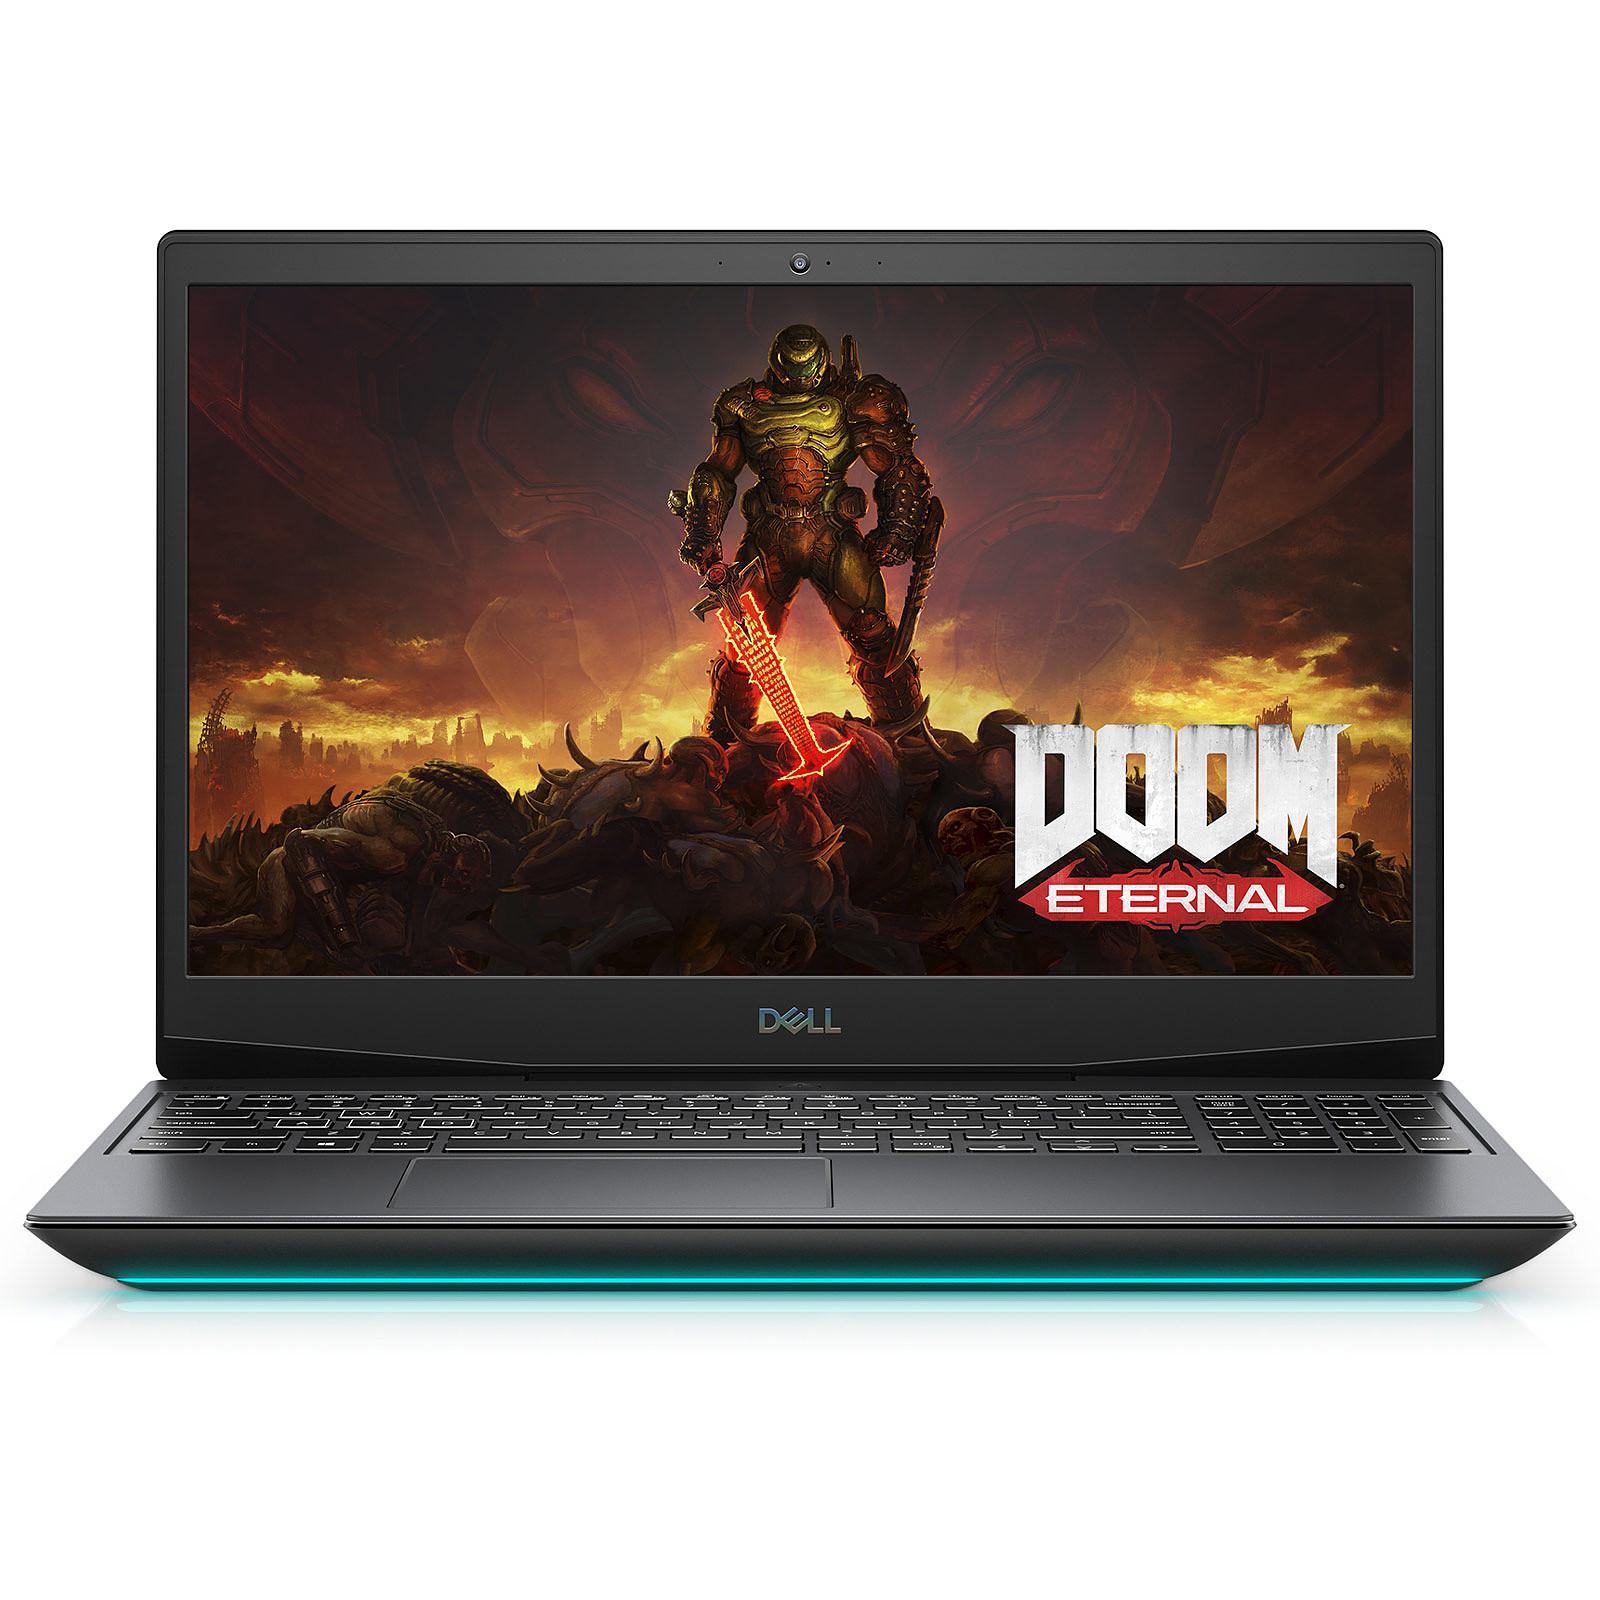 "PC portable 15.6"" Dell G5 15 - Full HD 144 Hz, i7-10750H, 8 Go RAM, 512 Go SSD Nvme, GTX 1660 Ti, Windows 10 (via ODR 100€)"